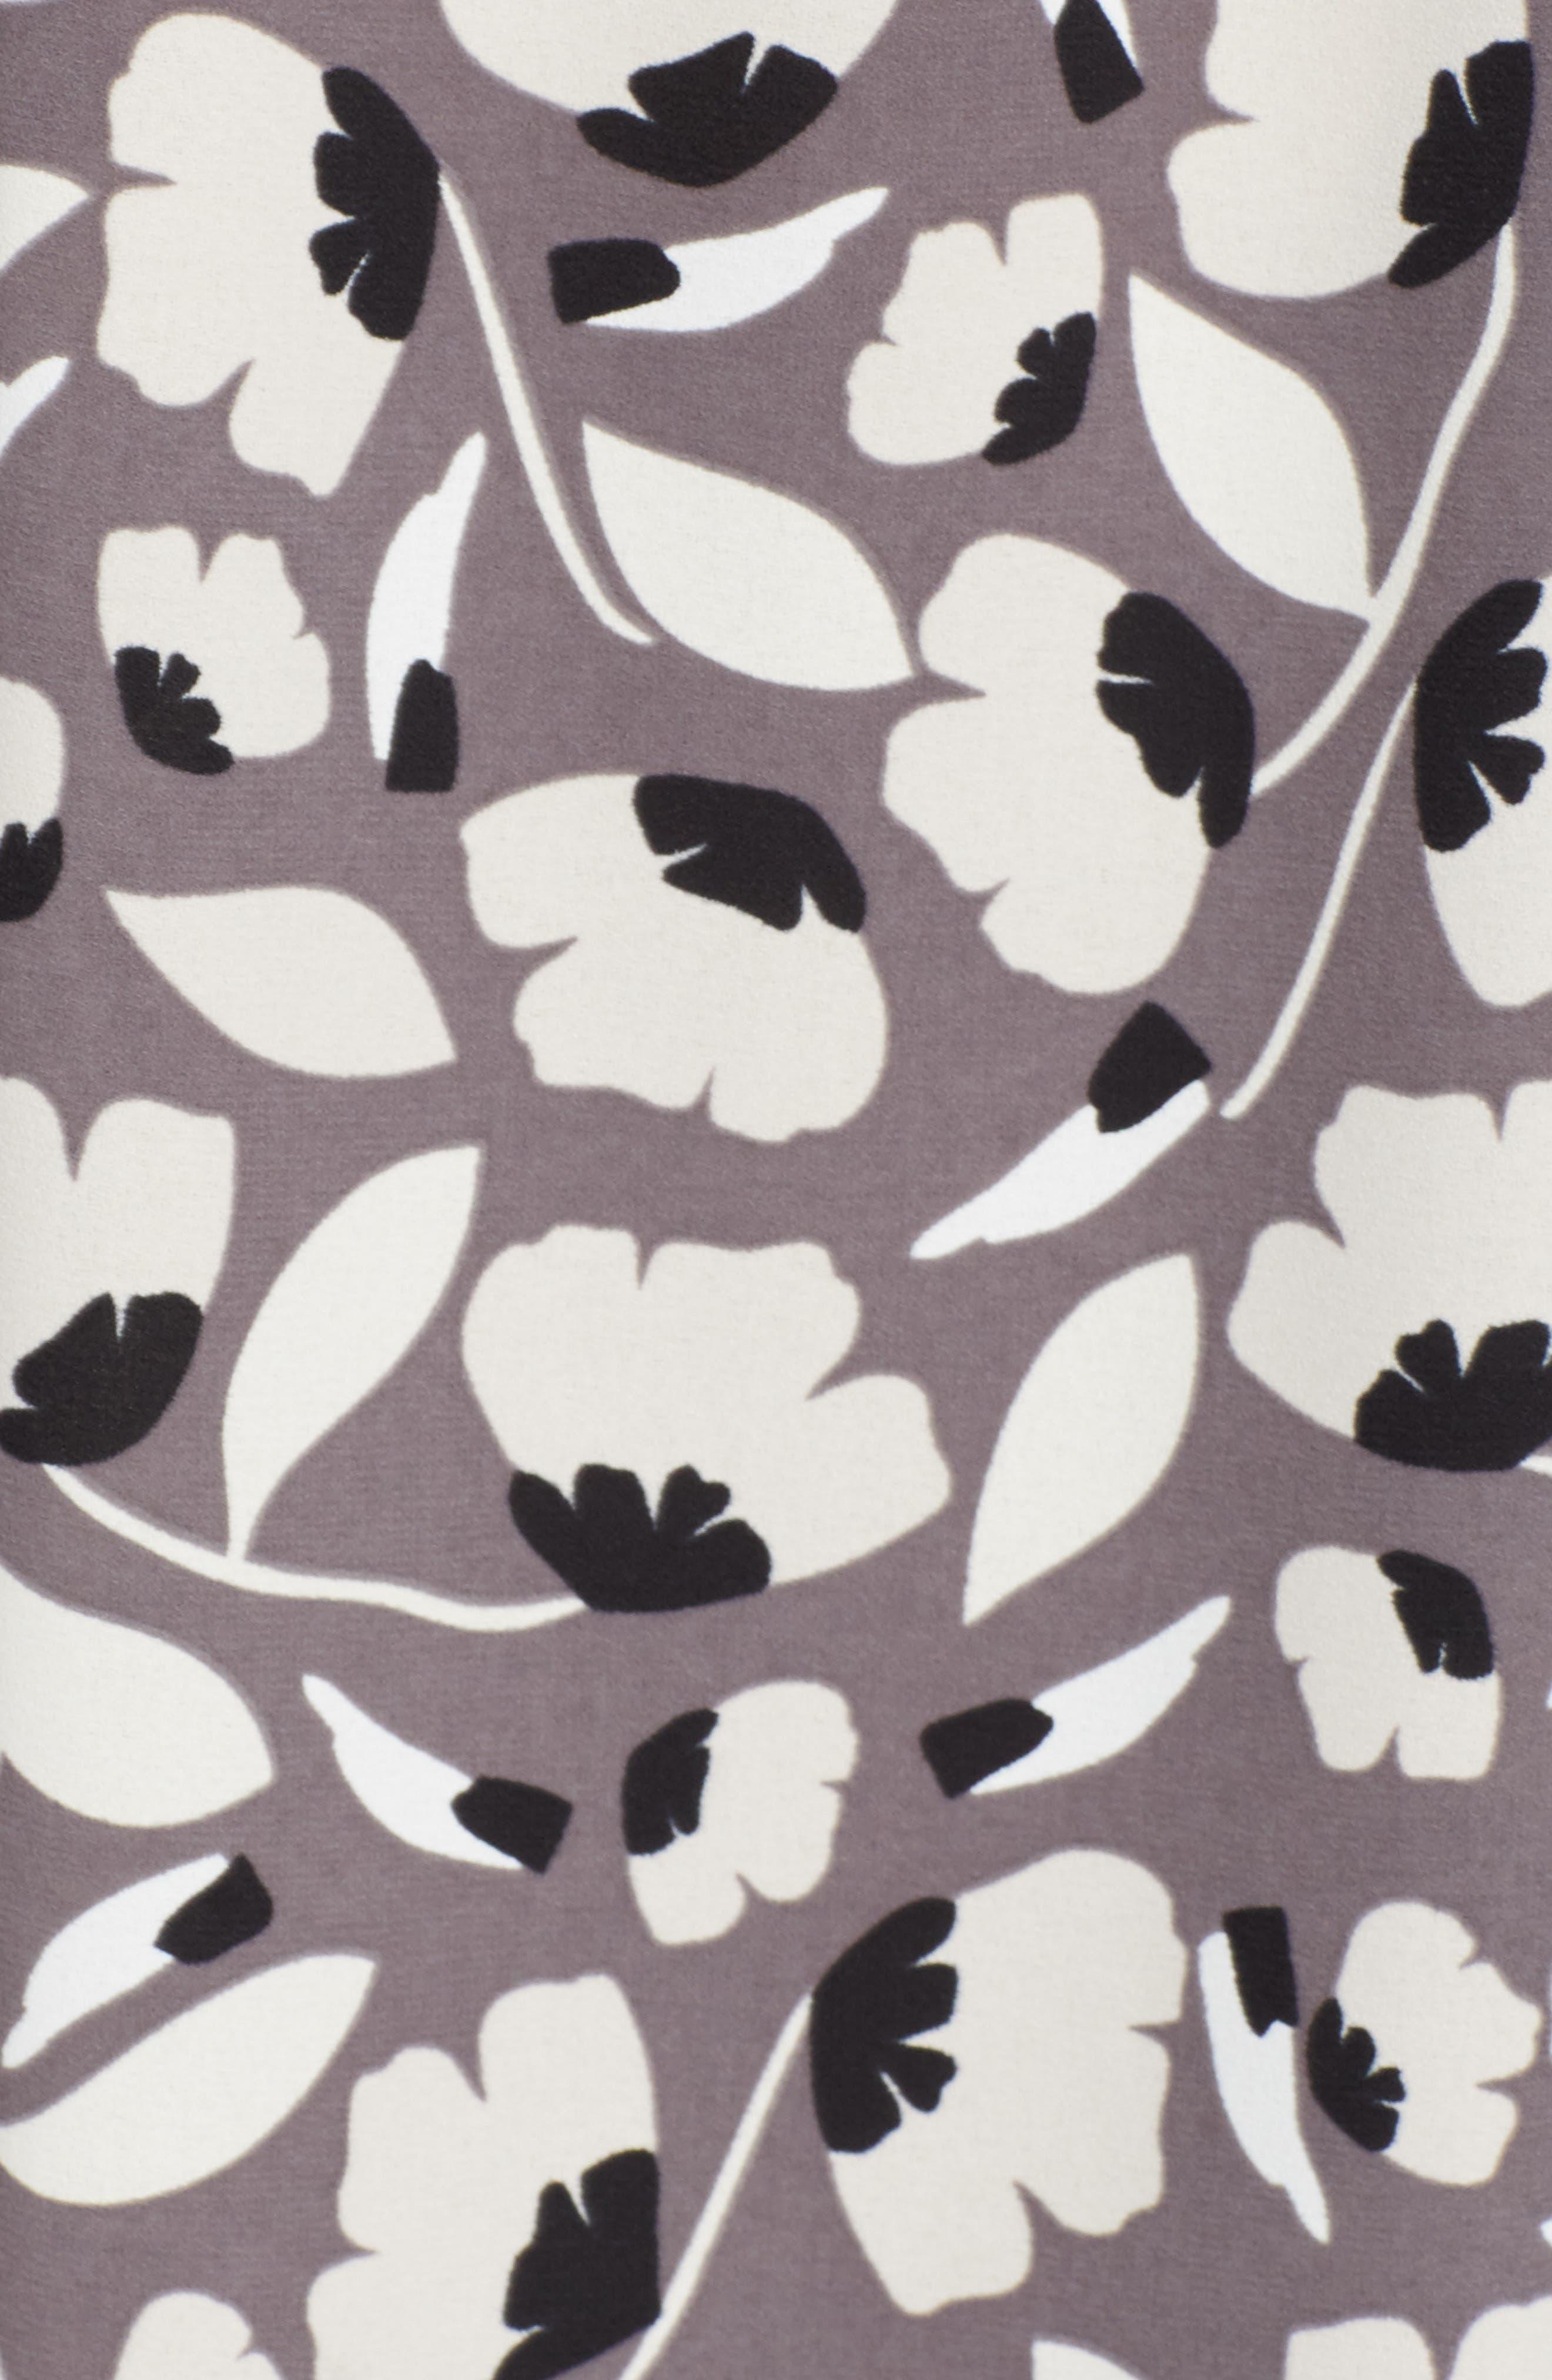 Floral Drawstring Dress,                             Alternate thumbnail 6, color,                             Nantucket Grey/ Oyster Shell